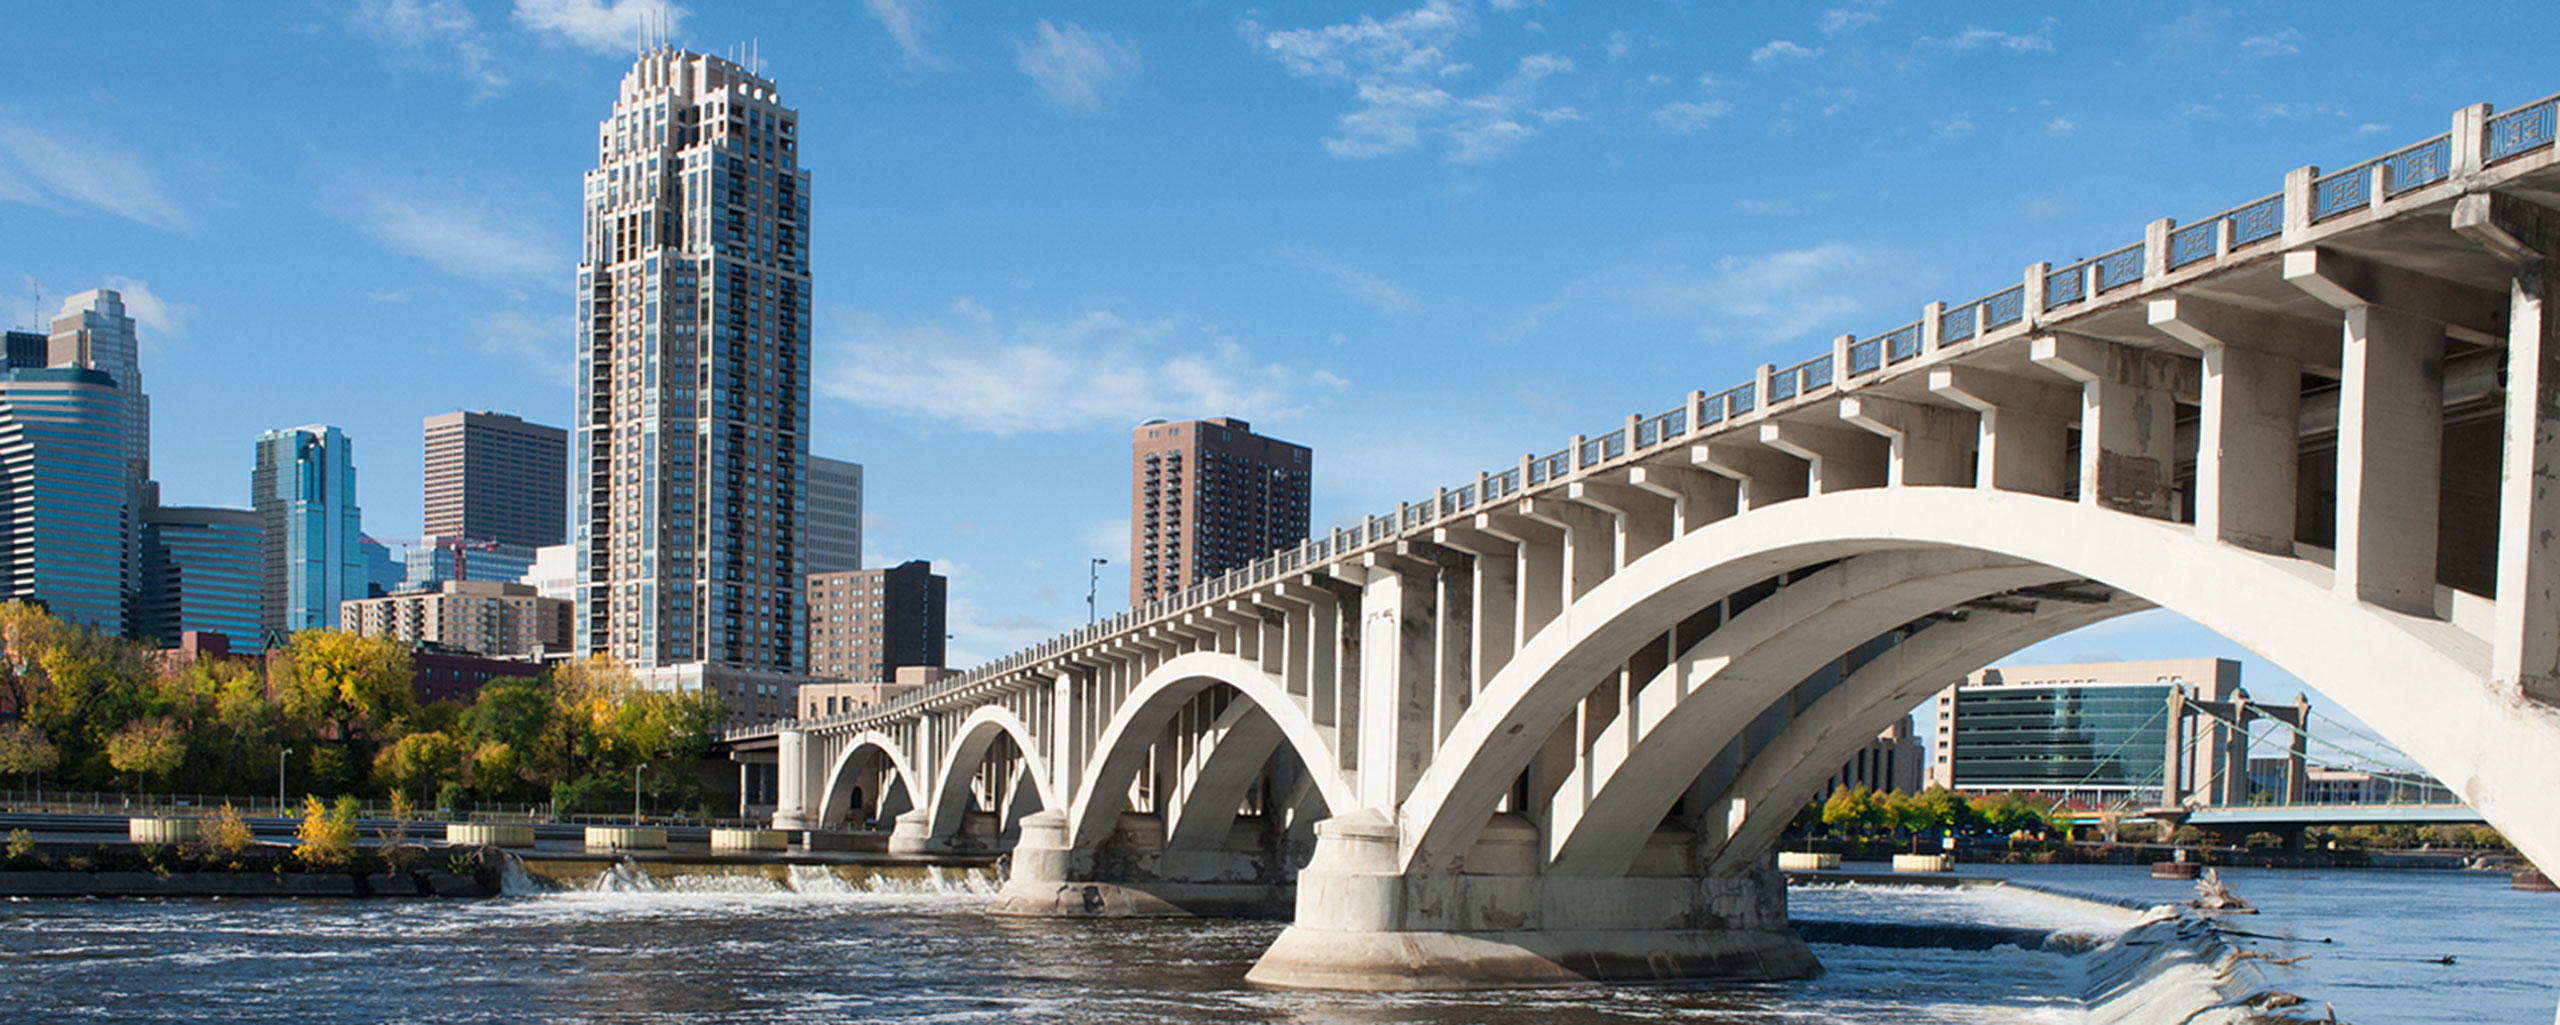 Minneapolis Skyline and 3rd Avenue Bridge. Photo by Krivit Photography, courtesy of Meet Minneapolis.